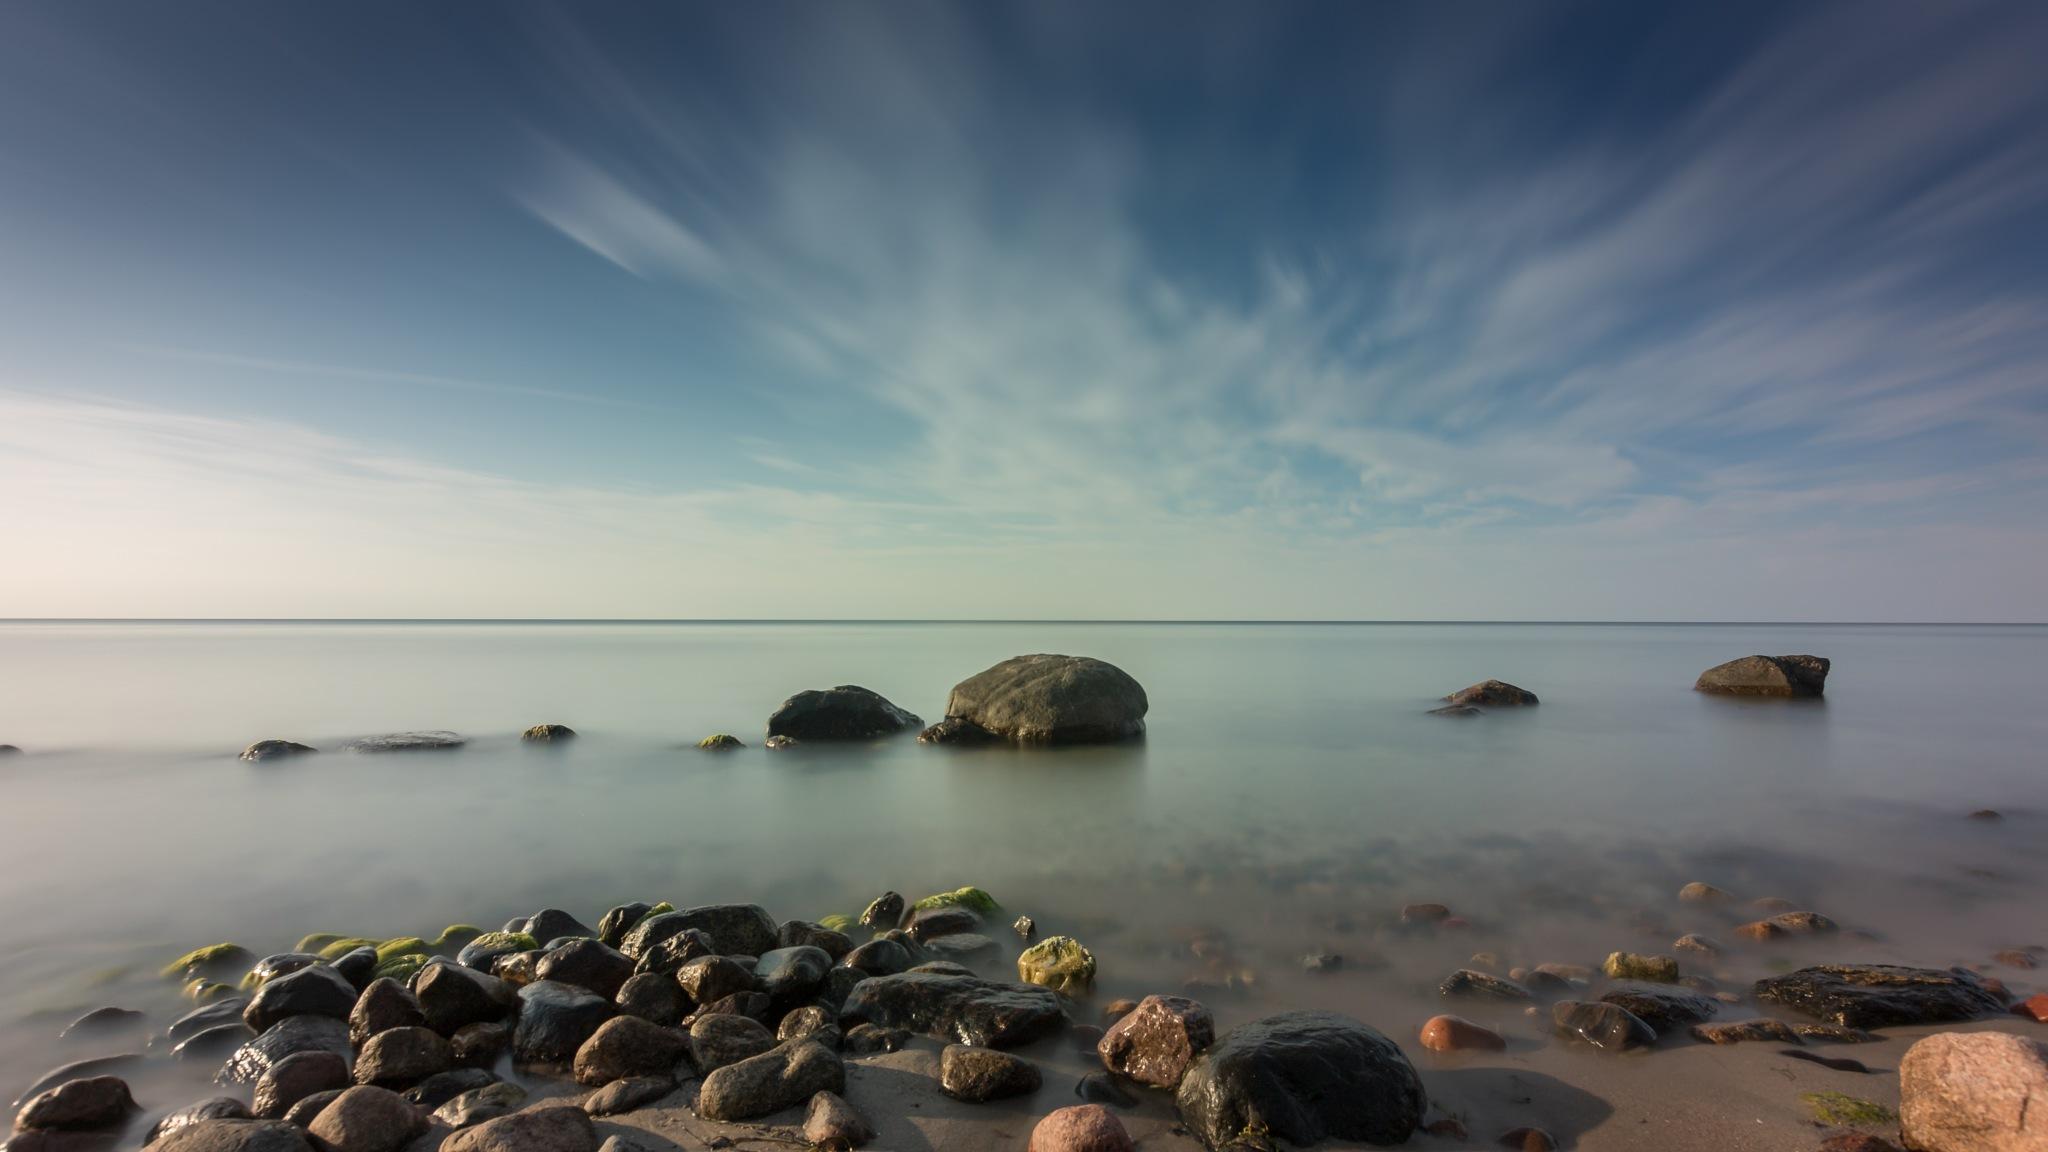 Beach by maybritt hansen